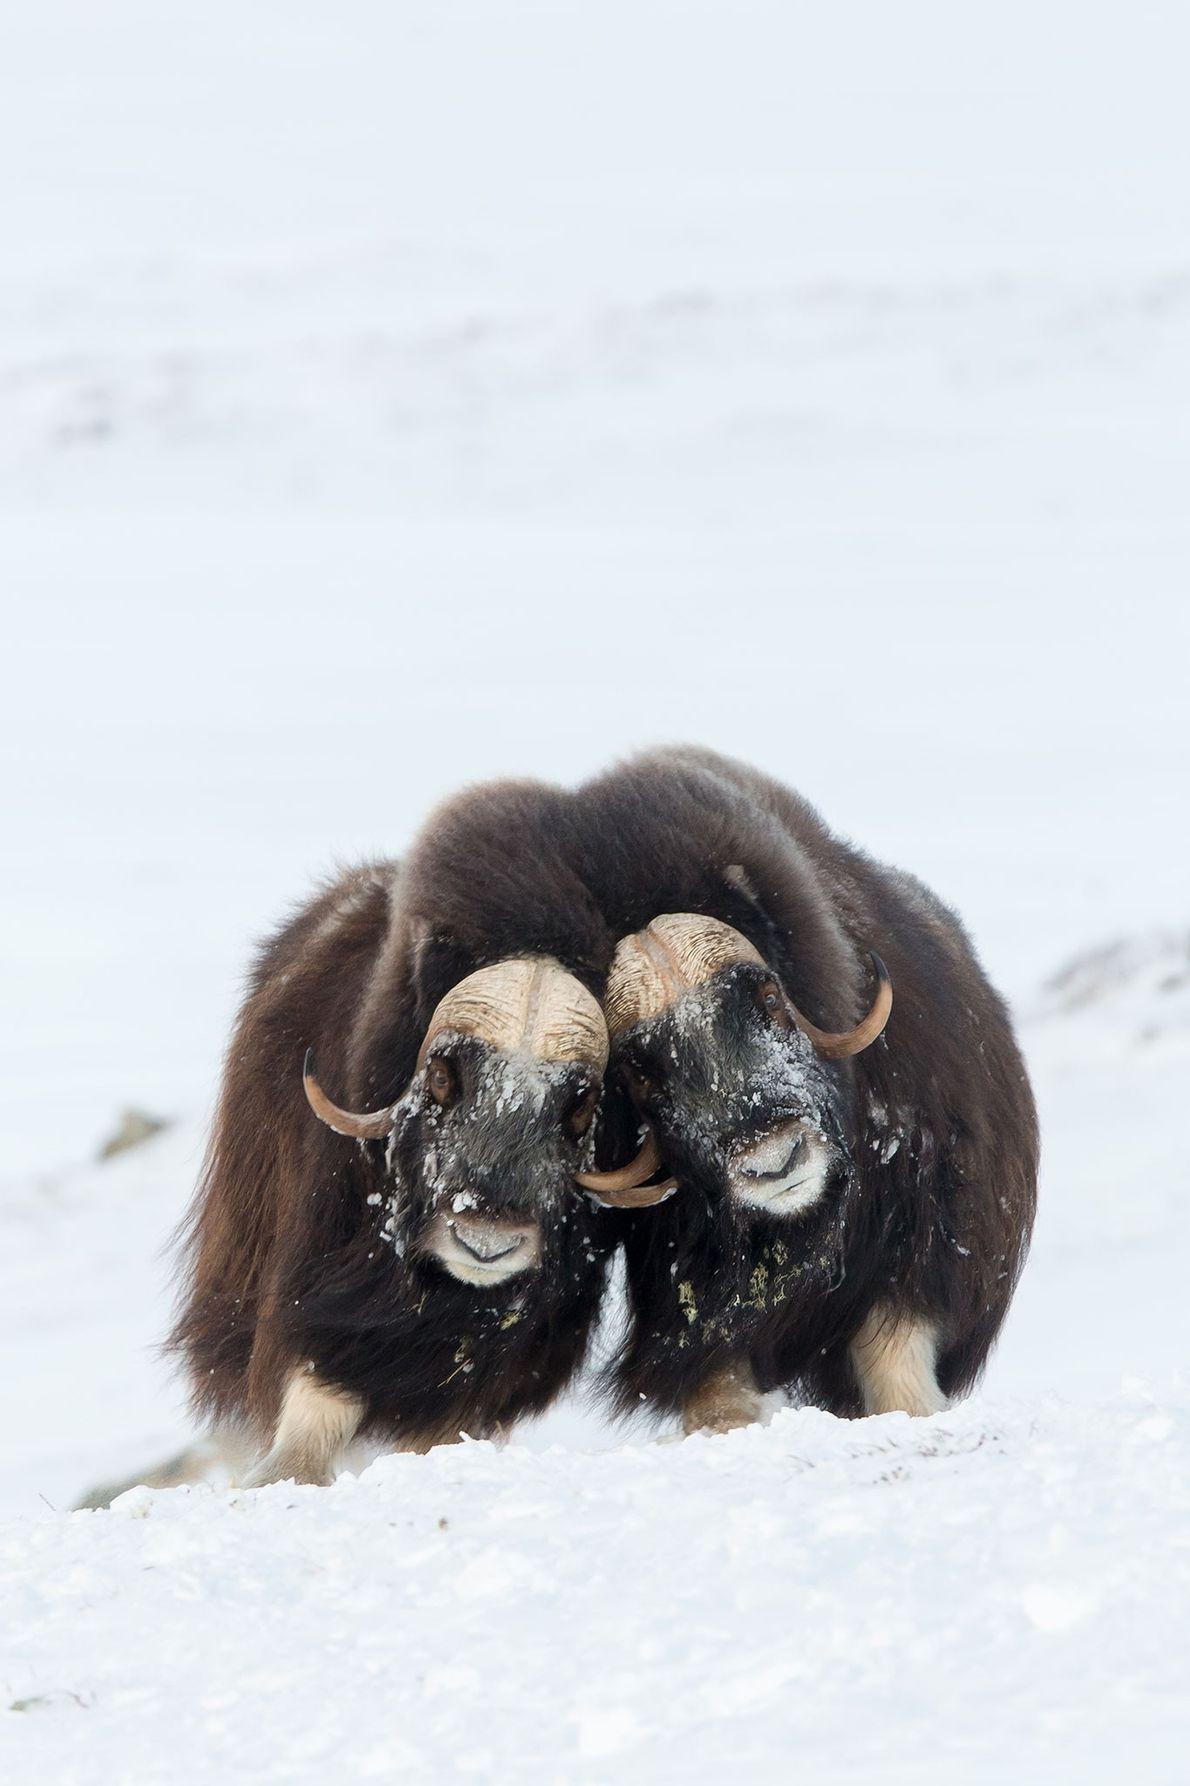 Zwei kämpfende Moschusochsen